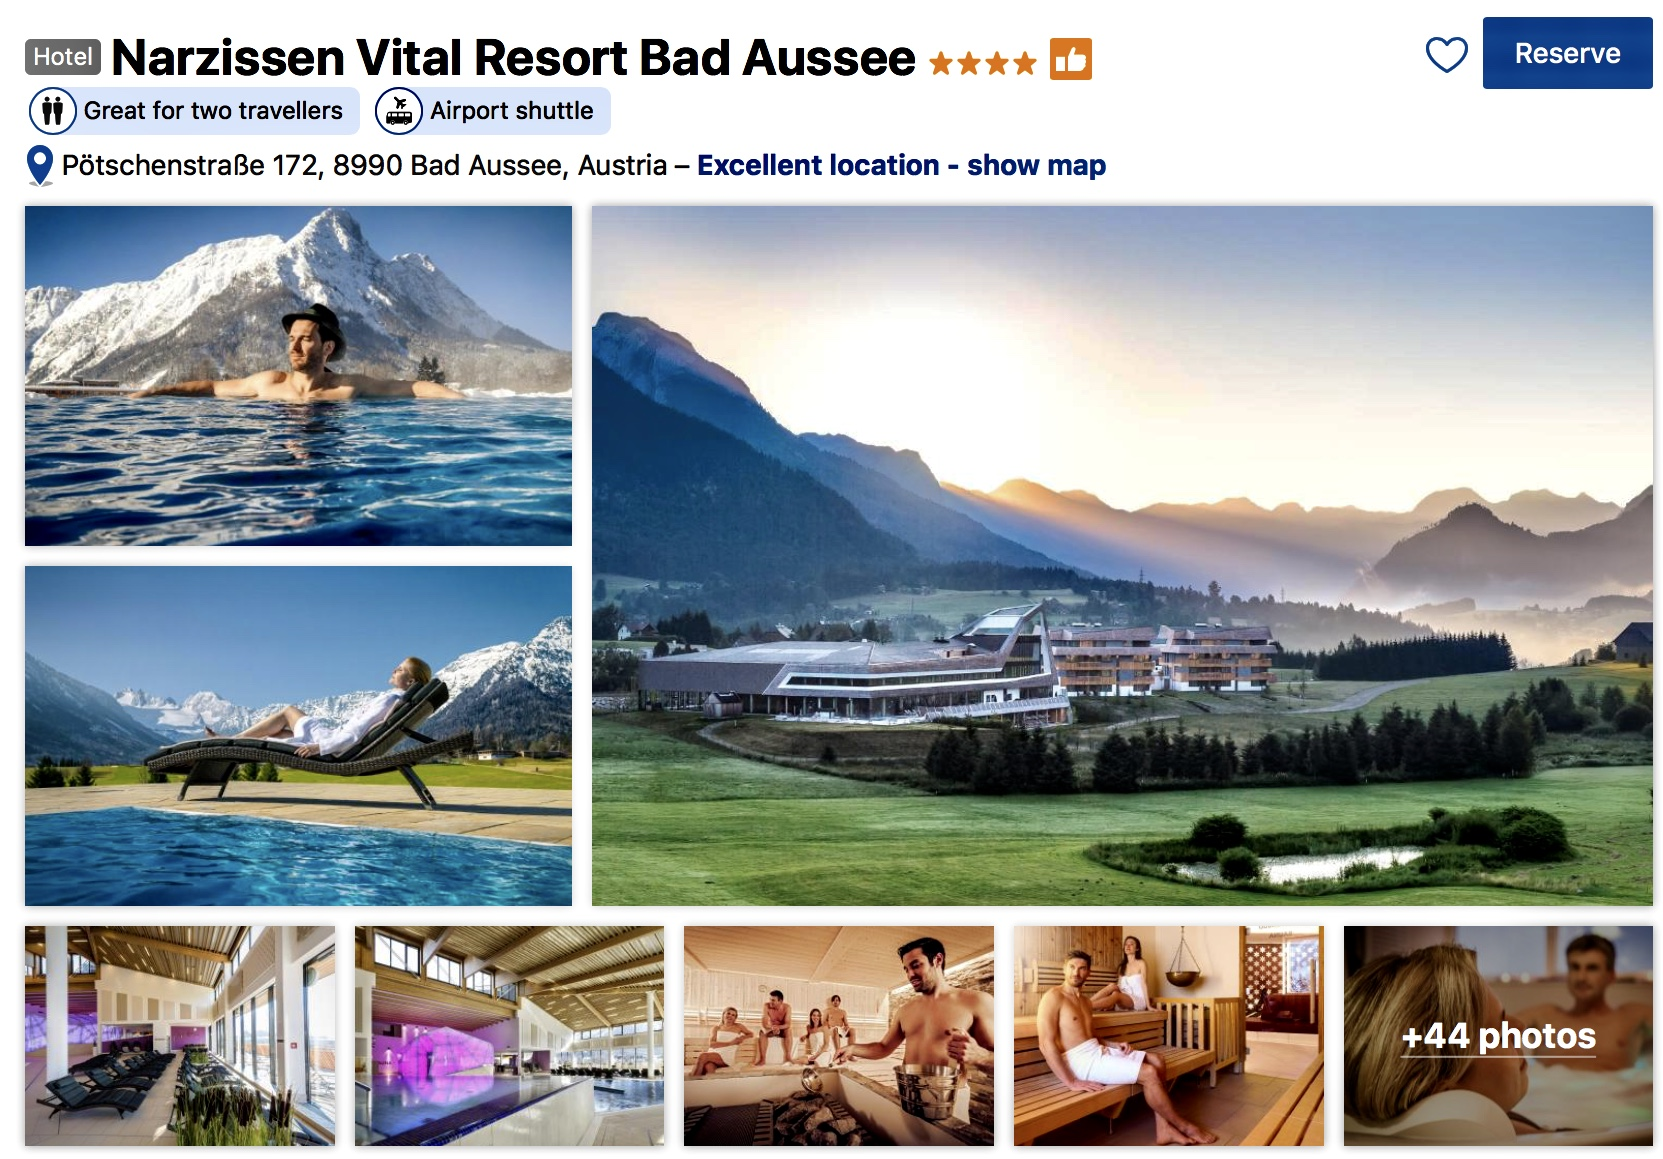 Narzissen Vital Resort Bad Aussee